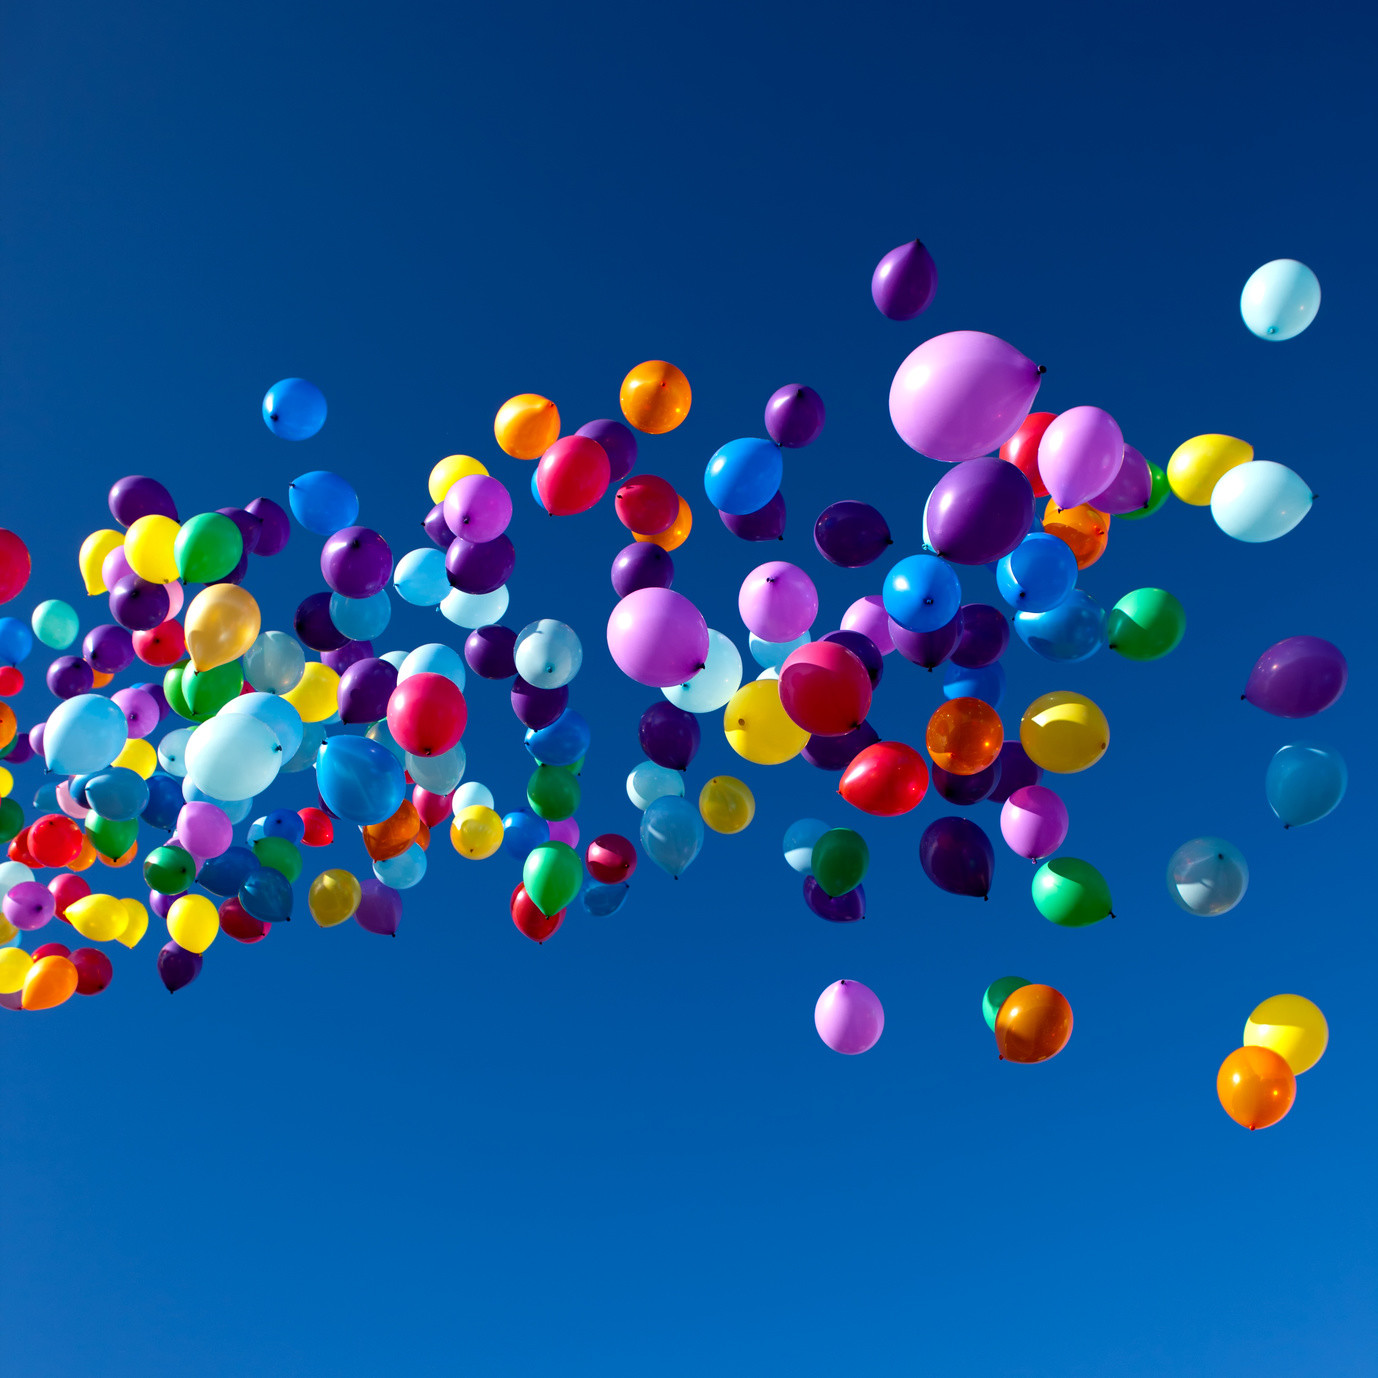 balloonerie luftballons in berlin prenzlauer berg. Black Bedroom Furniture Sets. Home Design Ideas